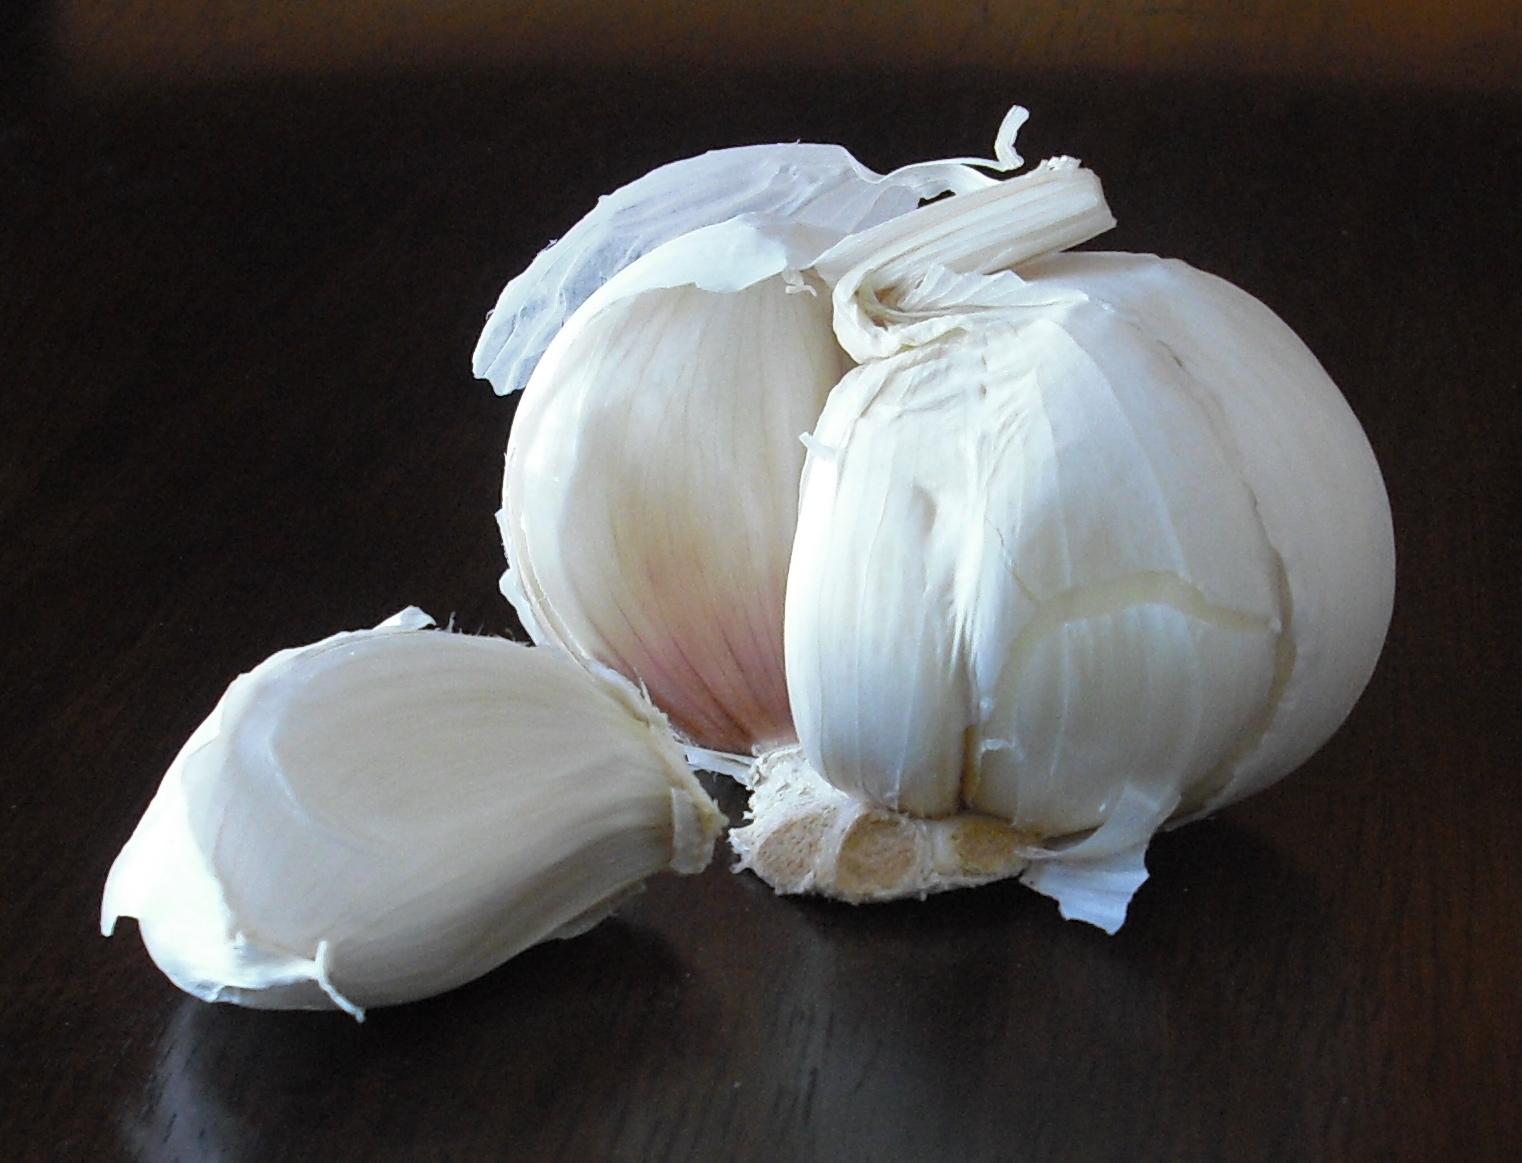 sekilas tentang bawang putih bawang putih allium sativum adalah ...